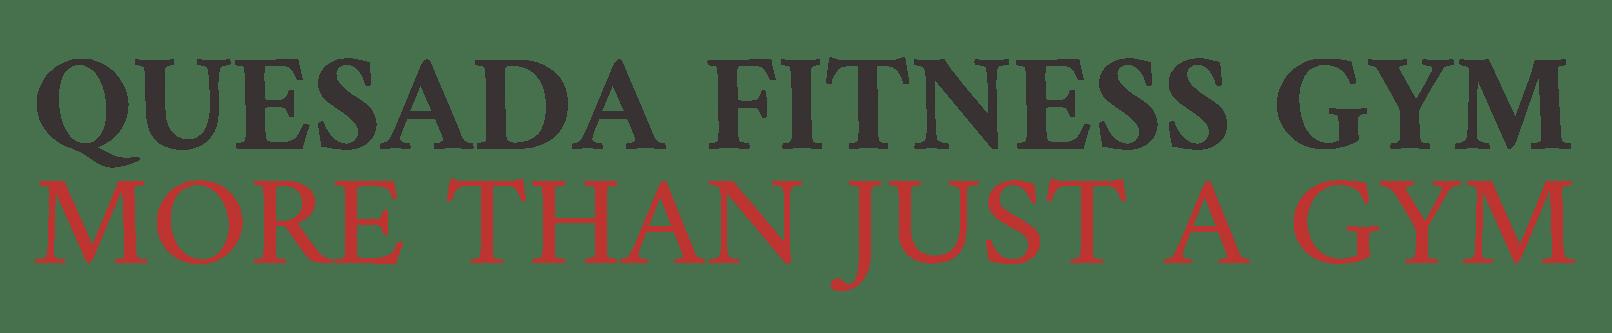 Quesada Fitness GYM